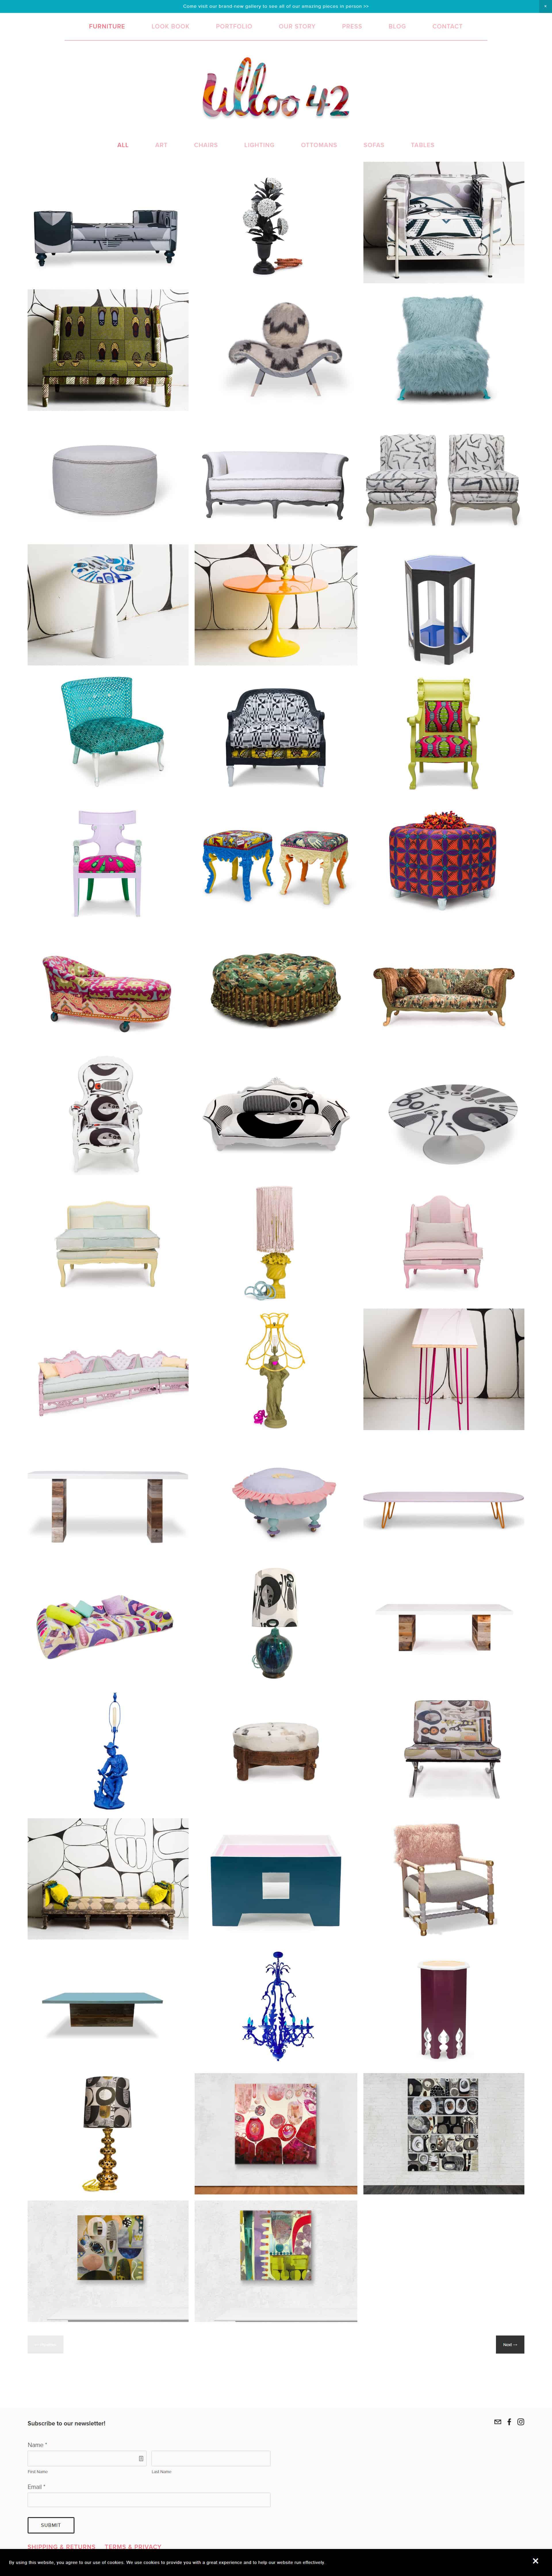 Online Shop Design & Layout Example